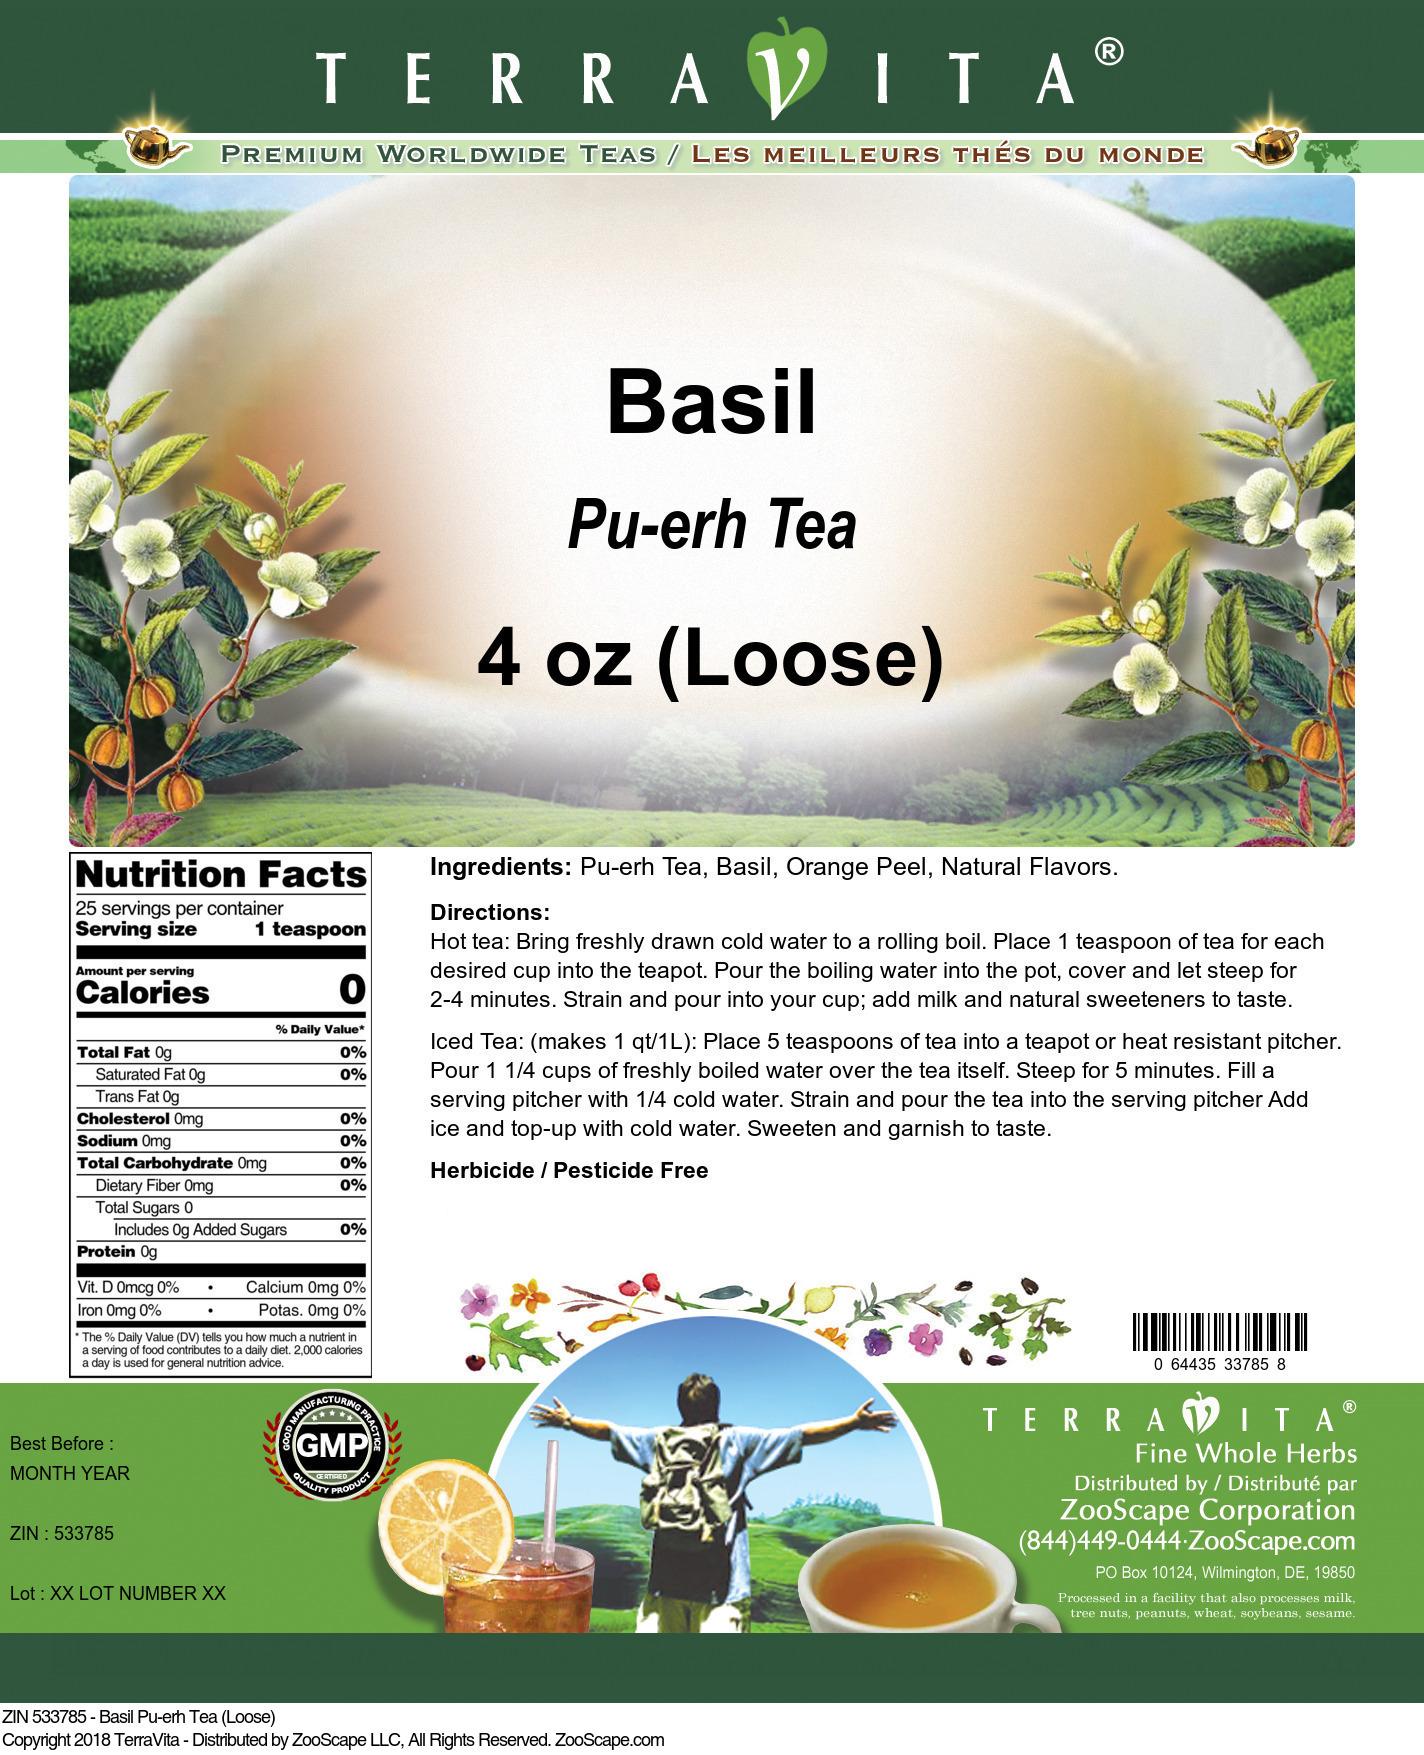 Basil Pu-erh Tea (Loose)